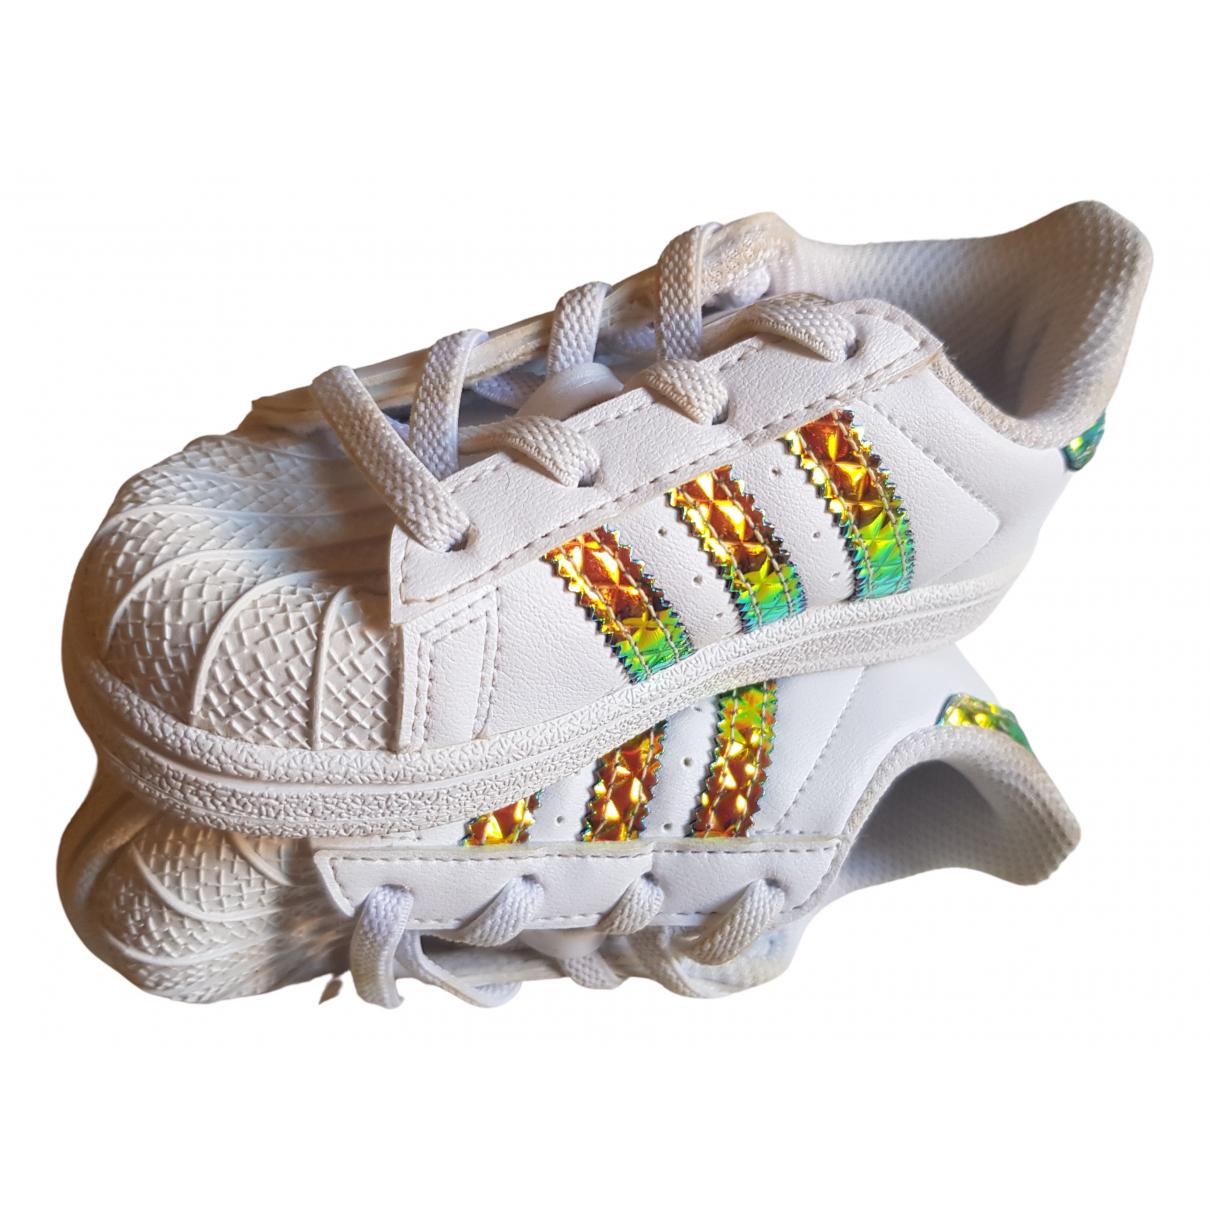 Adidas Superstar Sneakers in  Weiss Leder